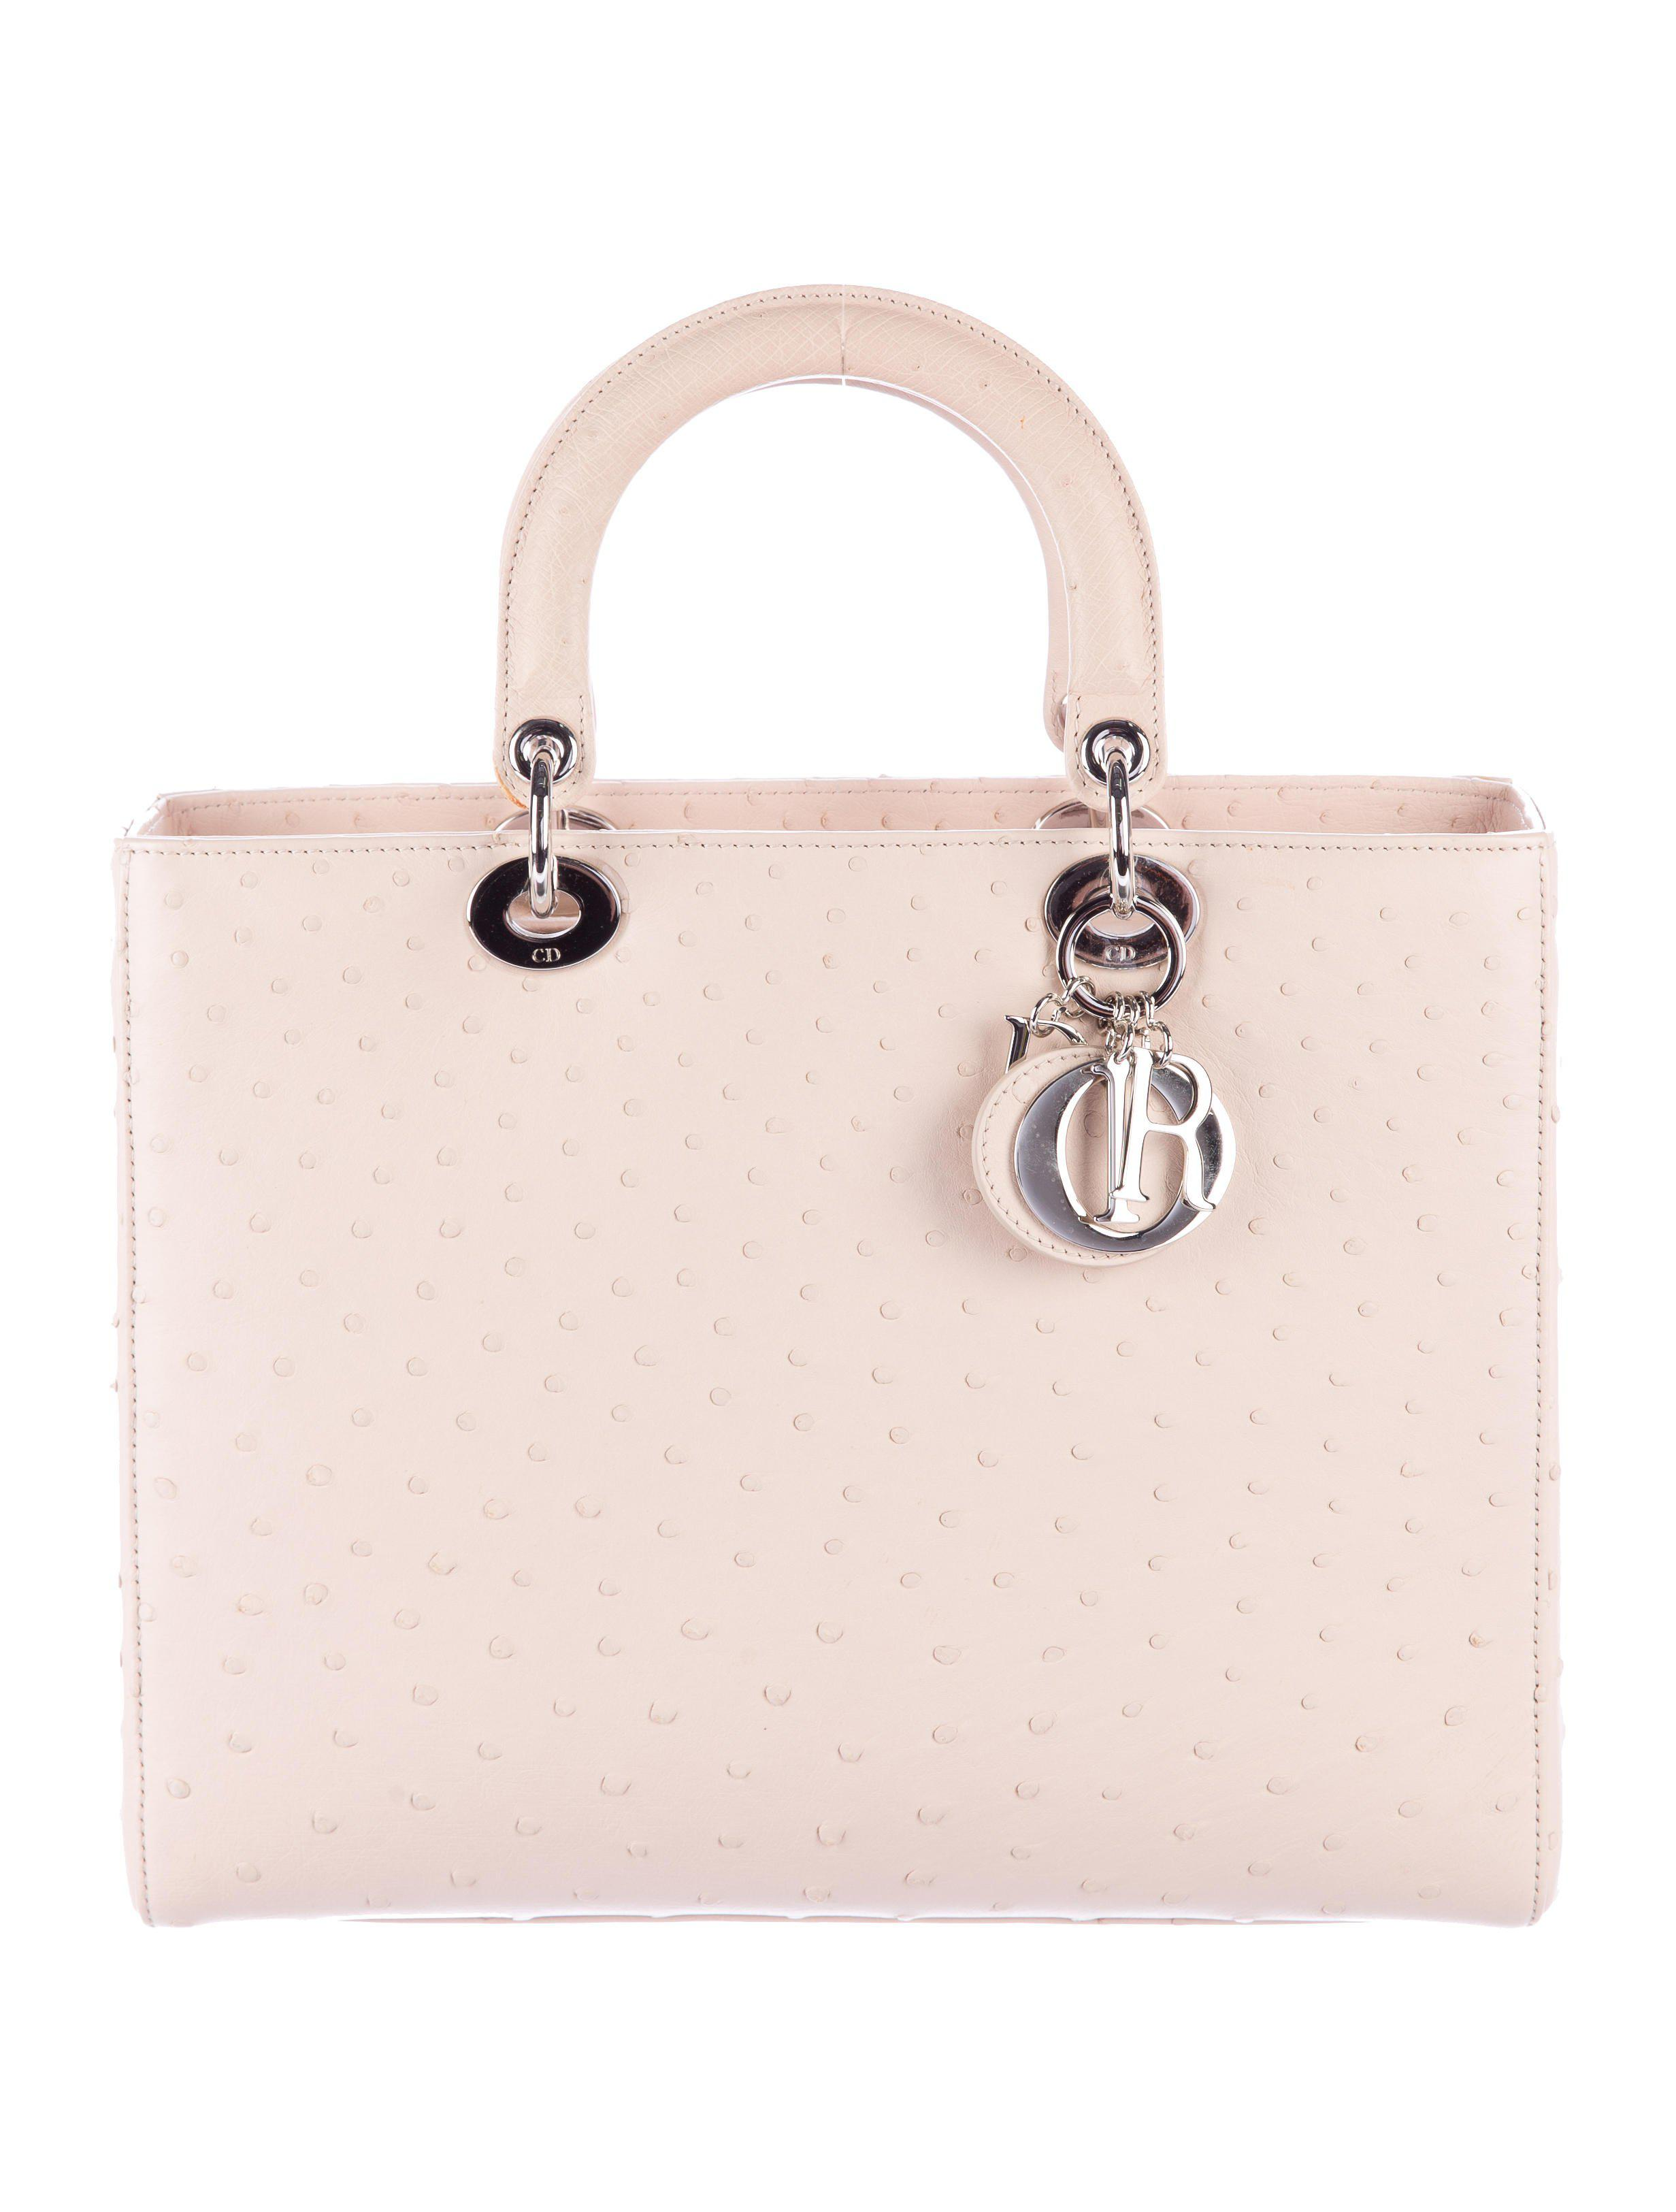 973c4d1d28c9 Lyst - Dior Ostrich Large Lady Bag Silver in Metallic